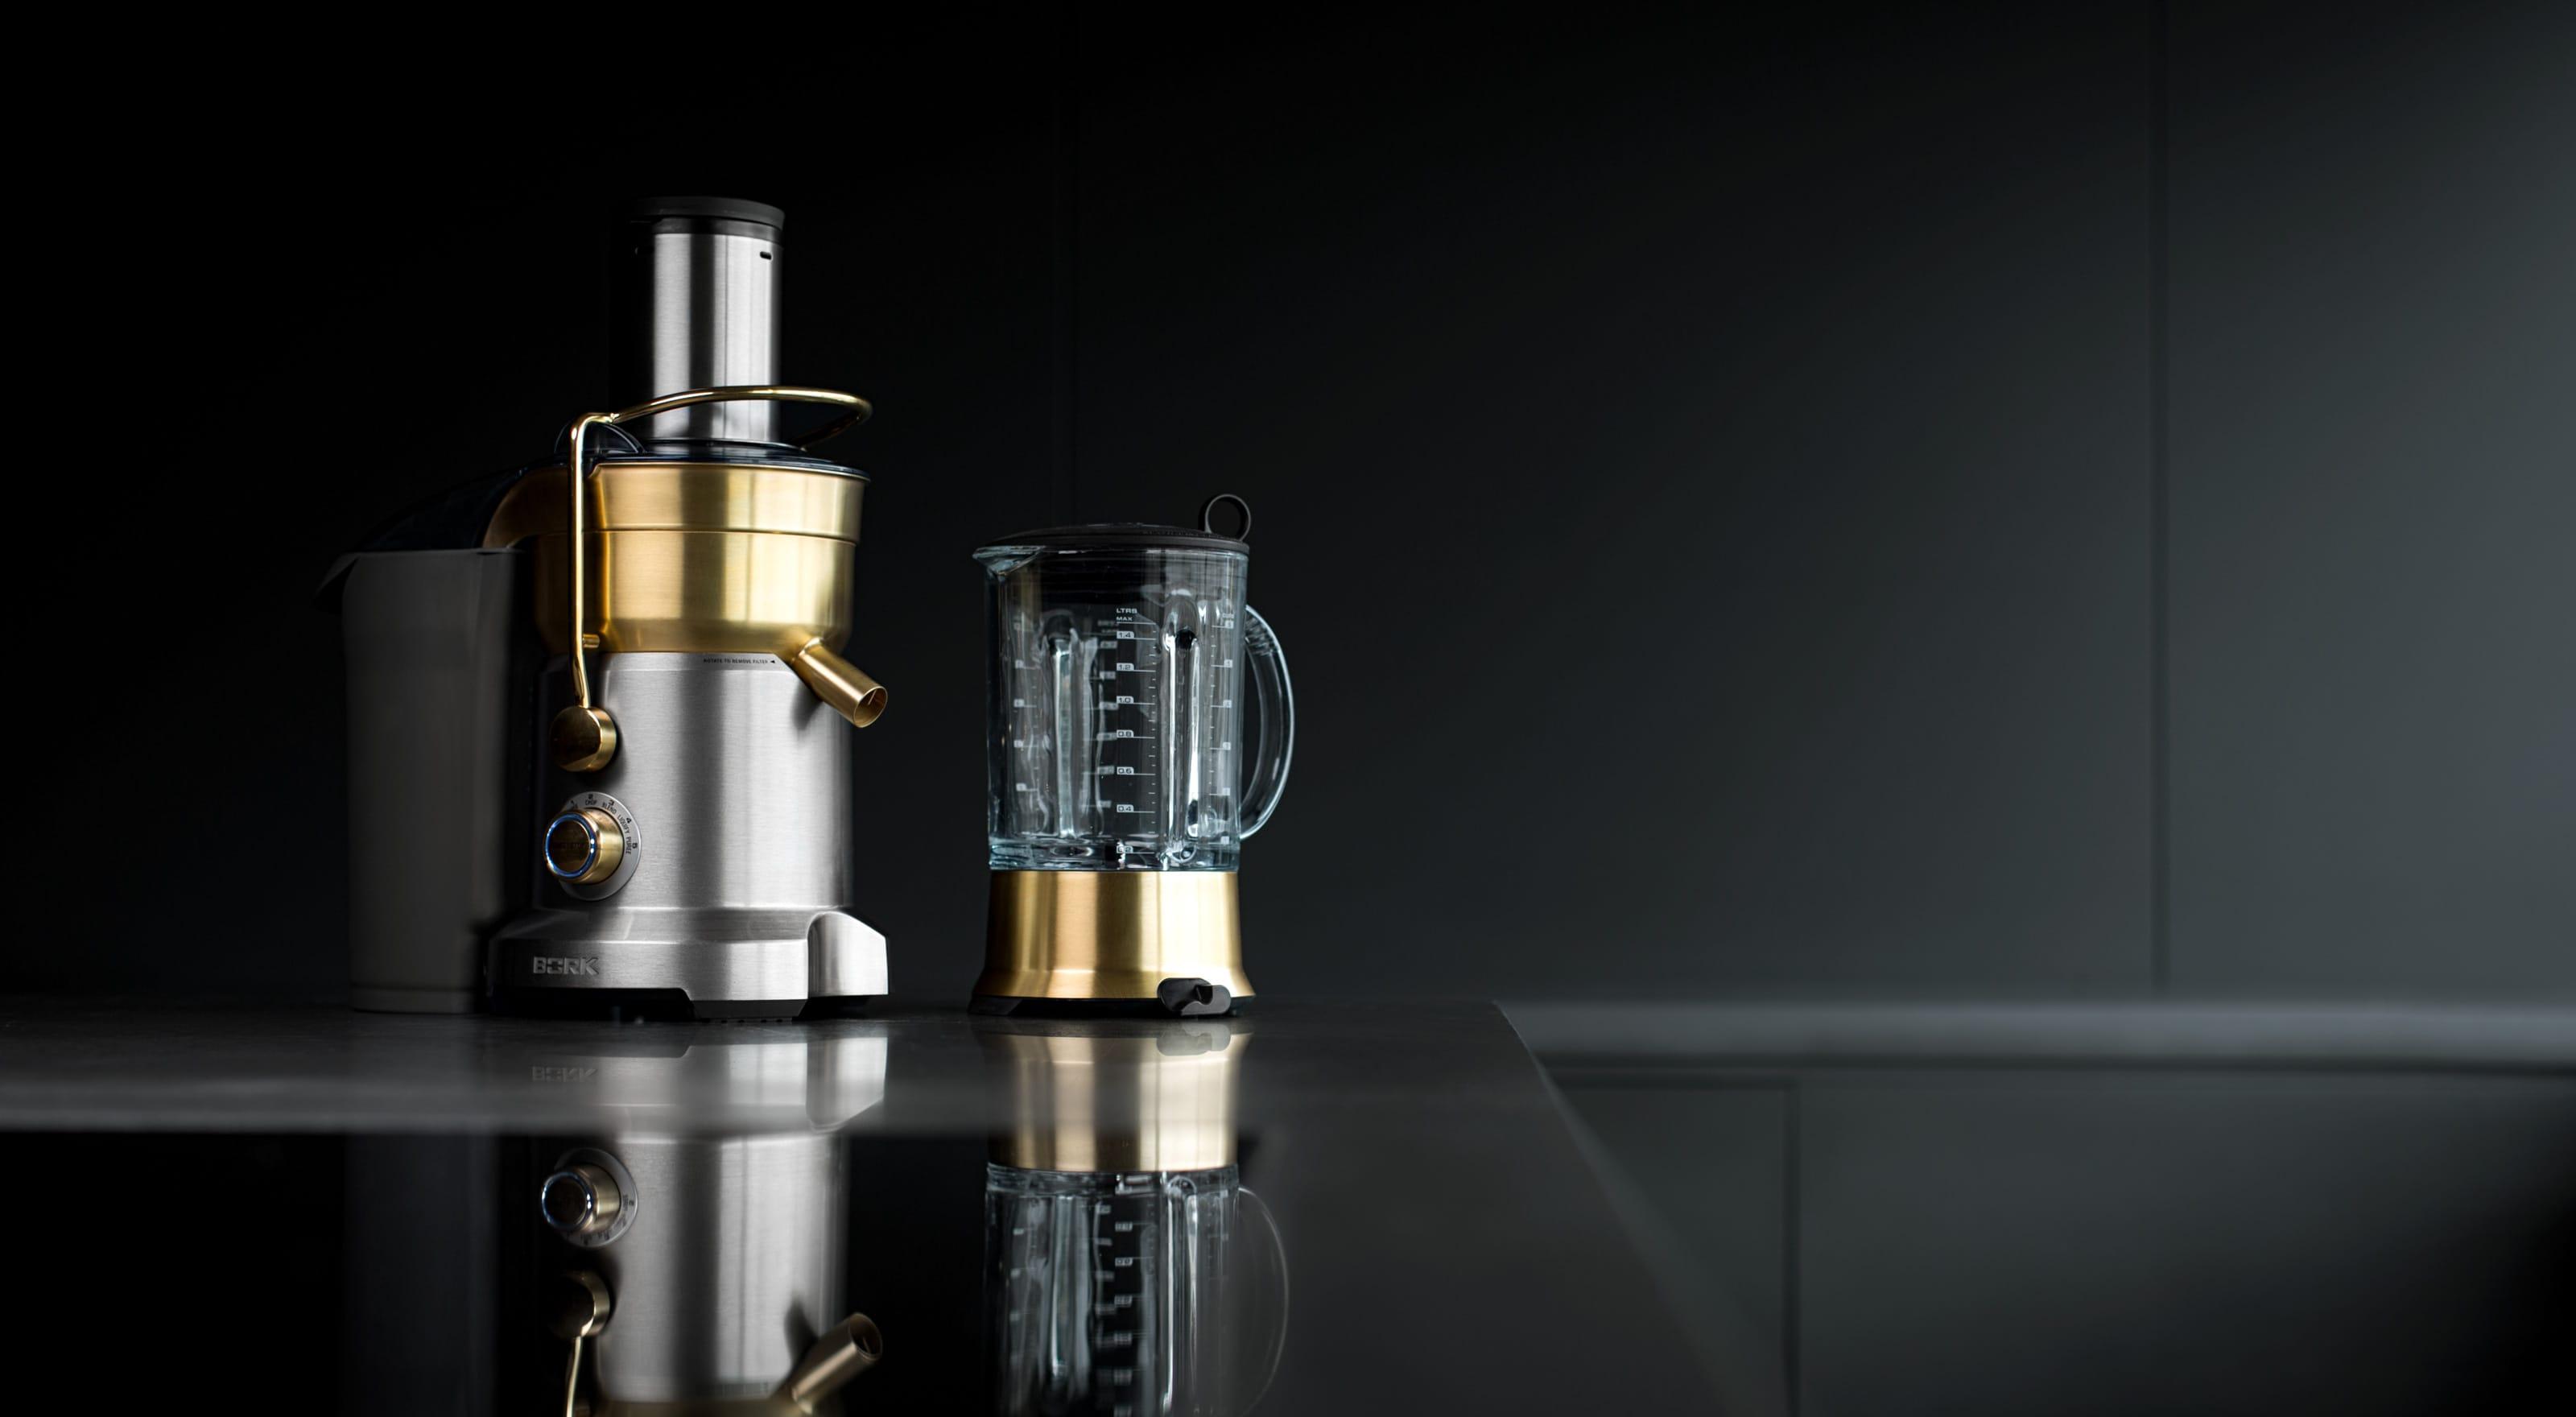 Сокоблендер S810 Gold